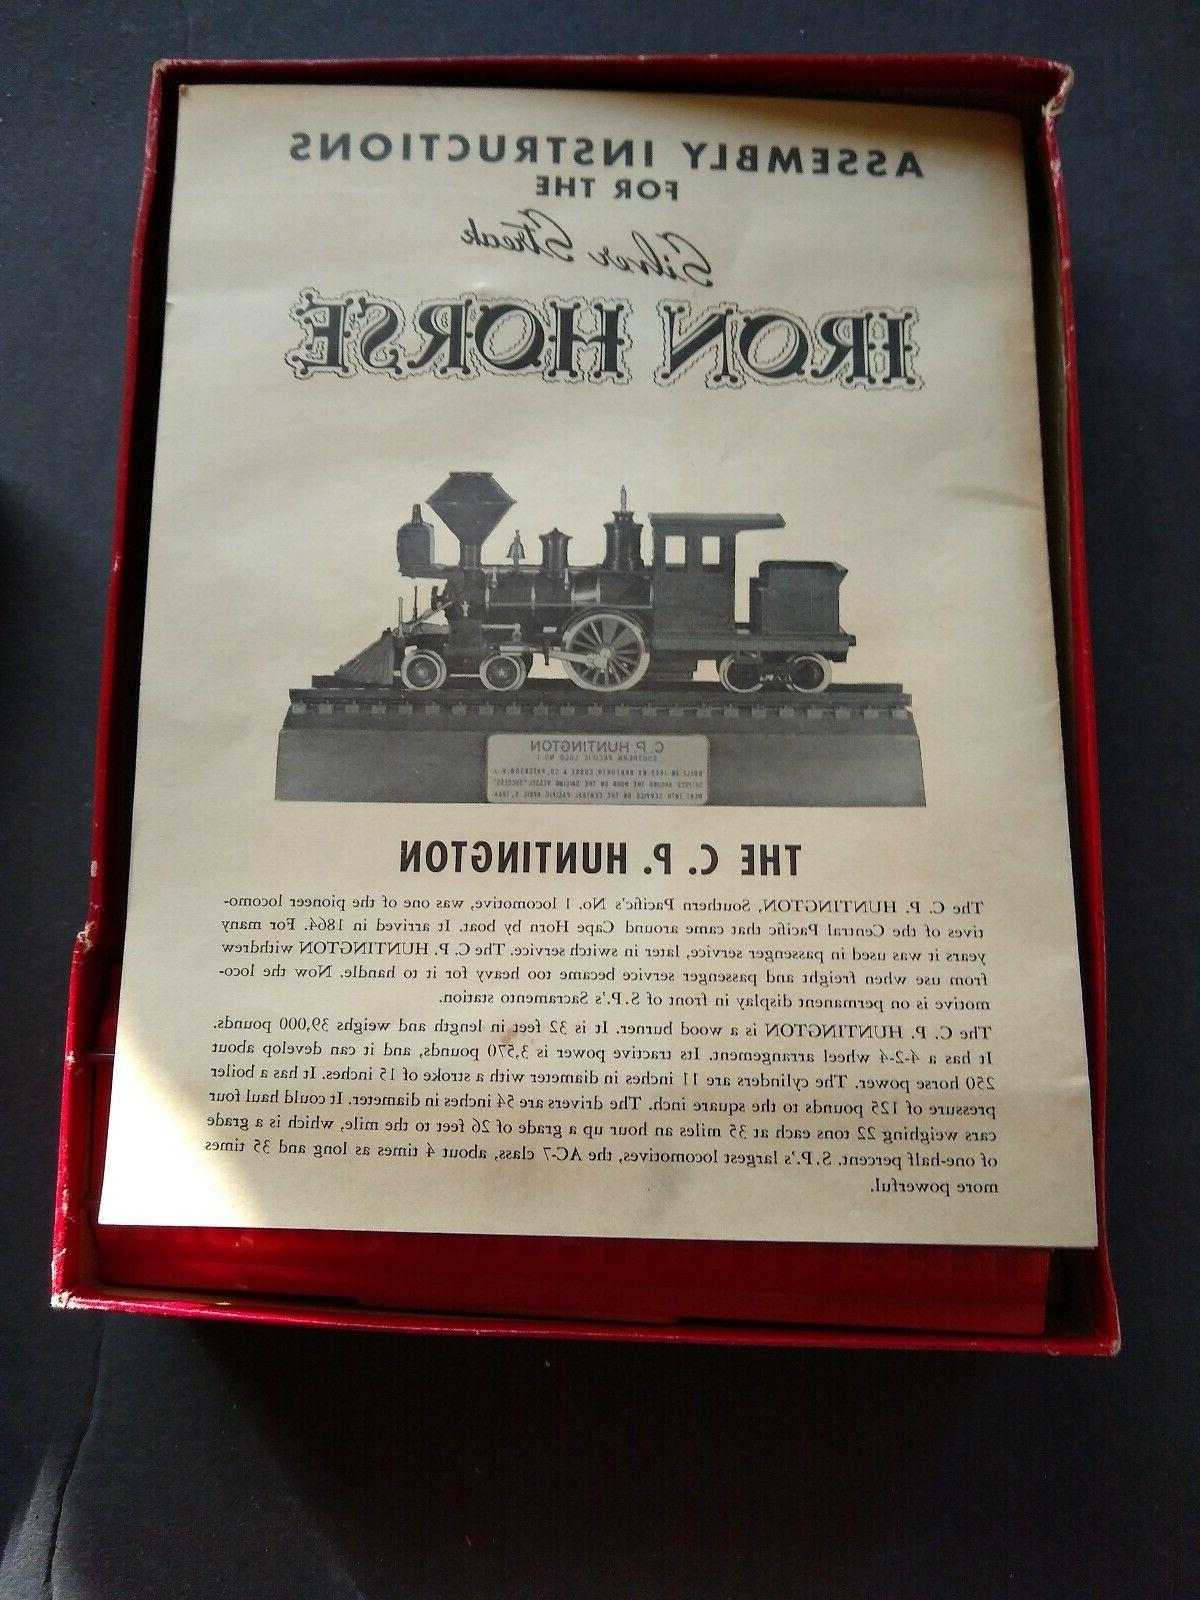 Southern Pacific Streak Horse Kit